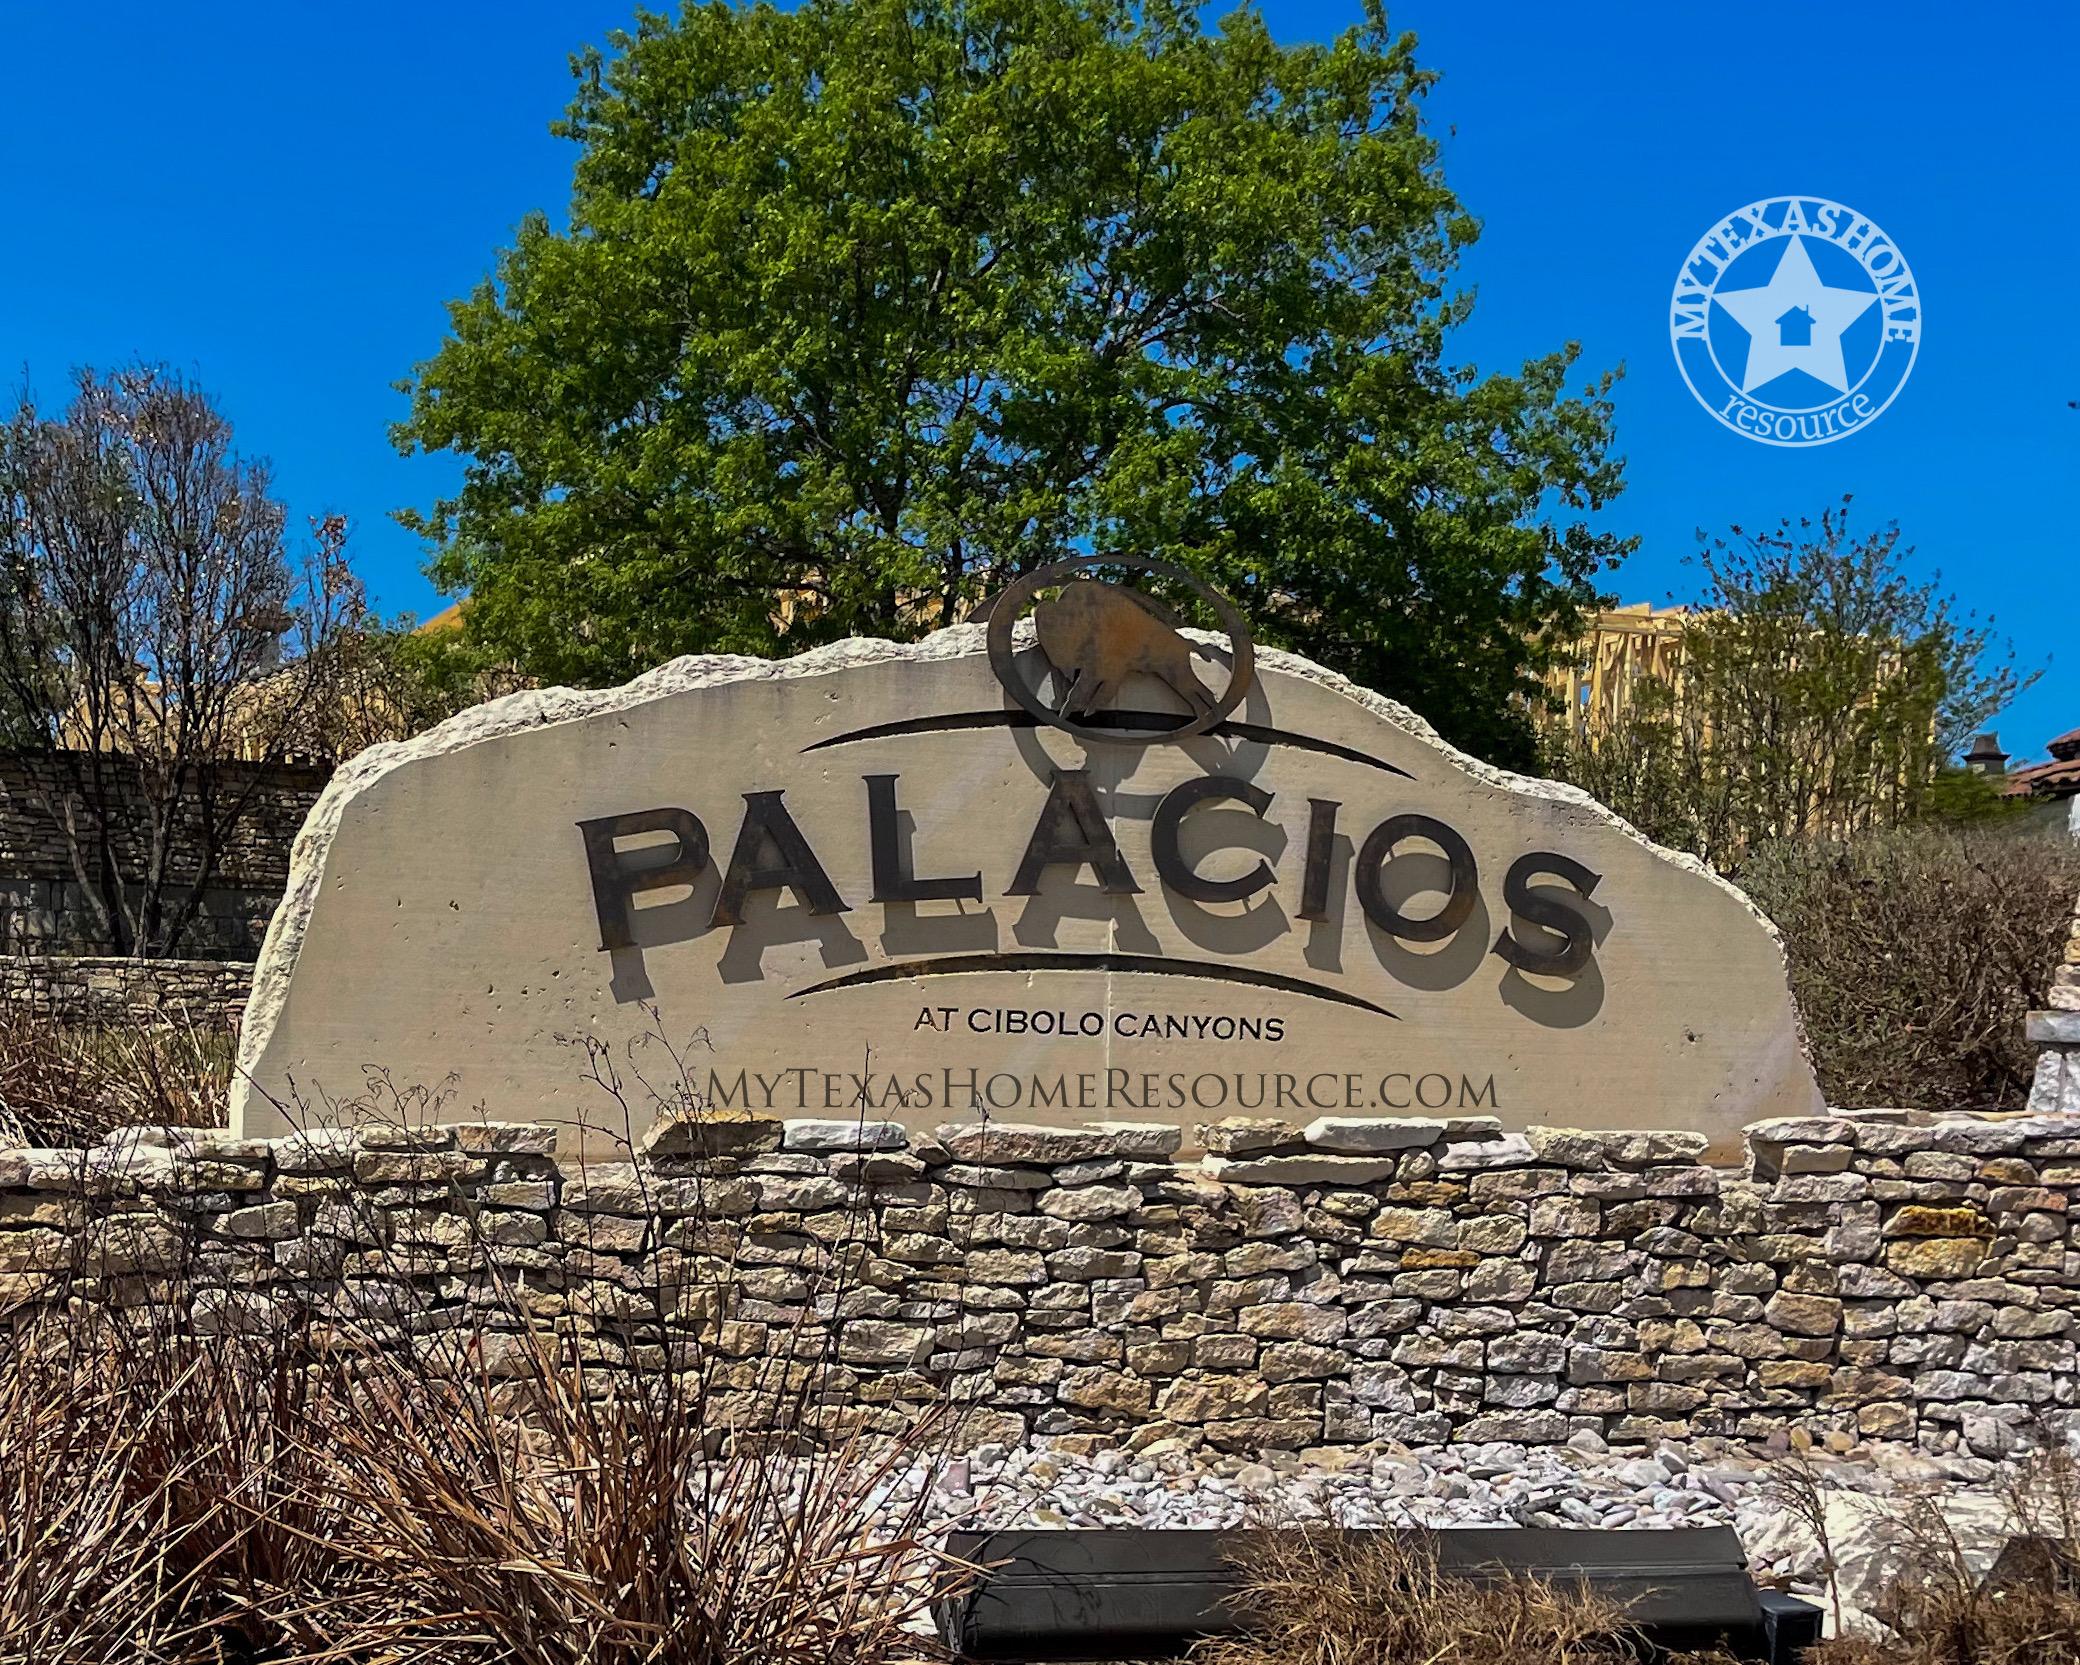 Palacios At Cibolo Canyons Community San Antonio, TX